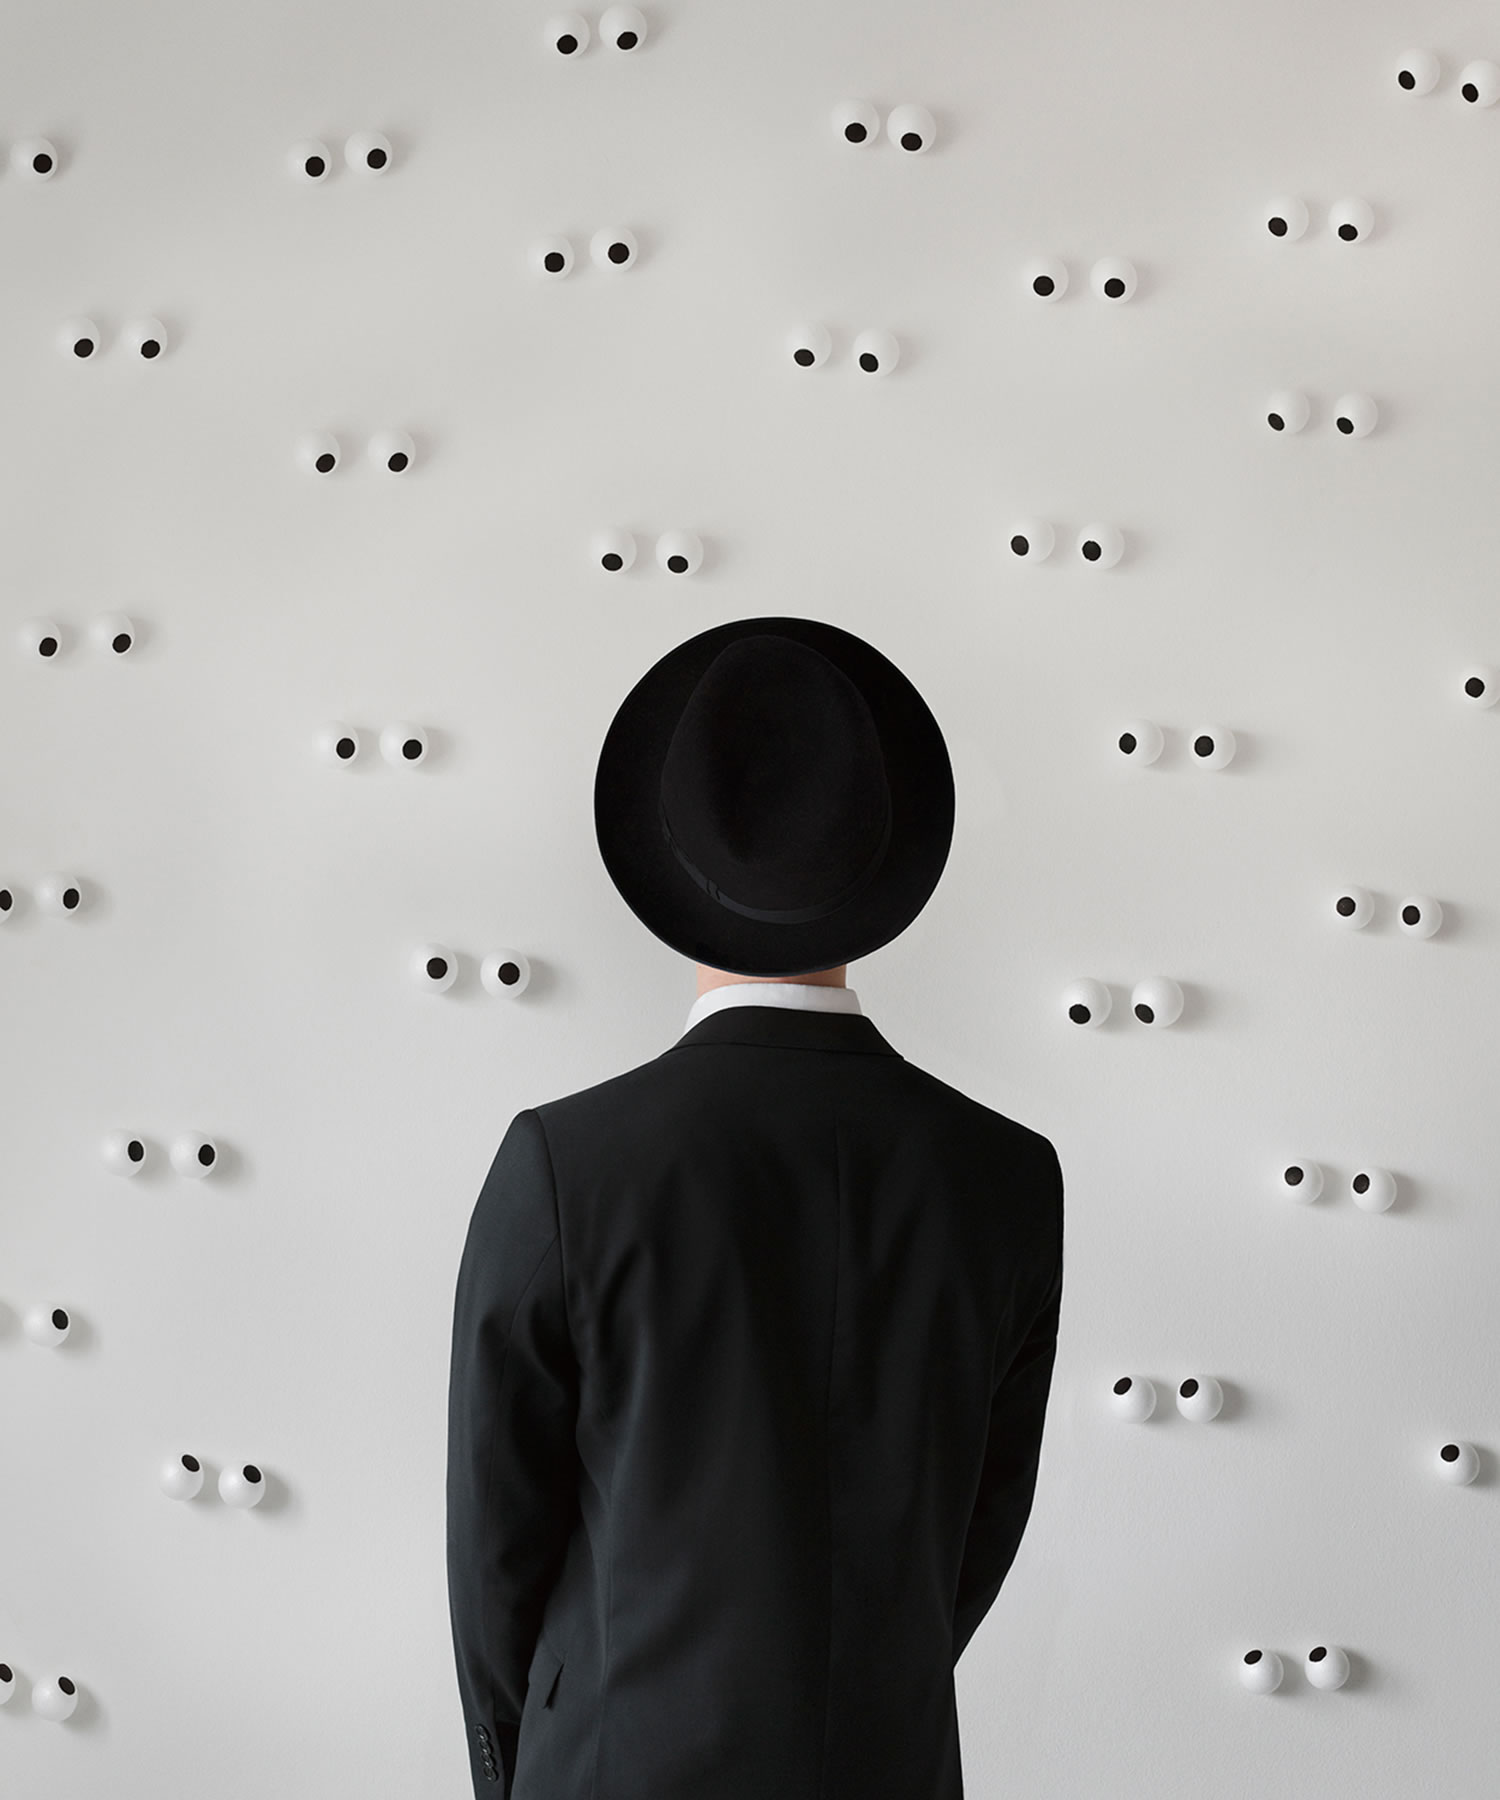 fotografi-ispirazione-rene-magritte-fotografia-arte-13